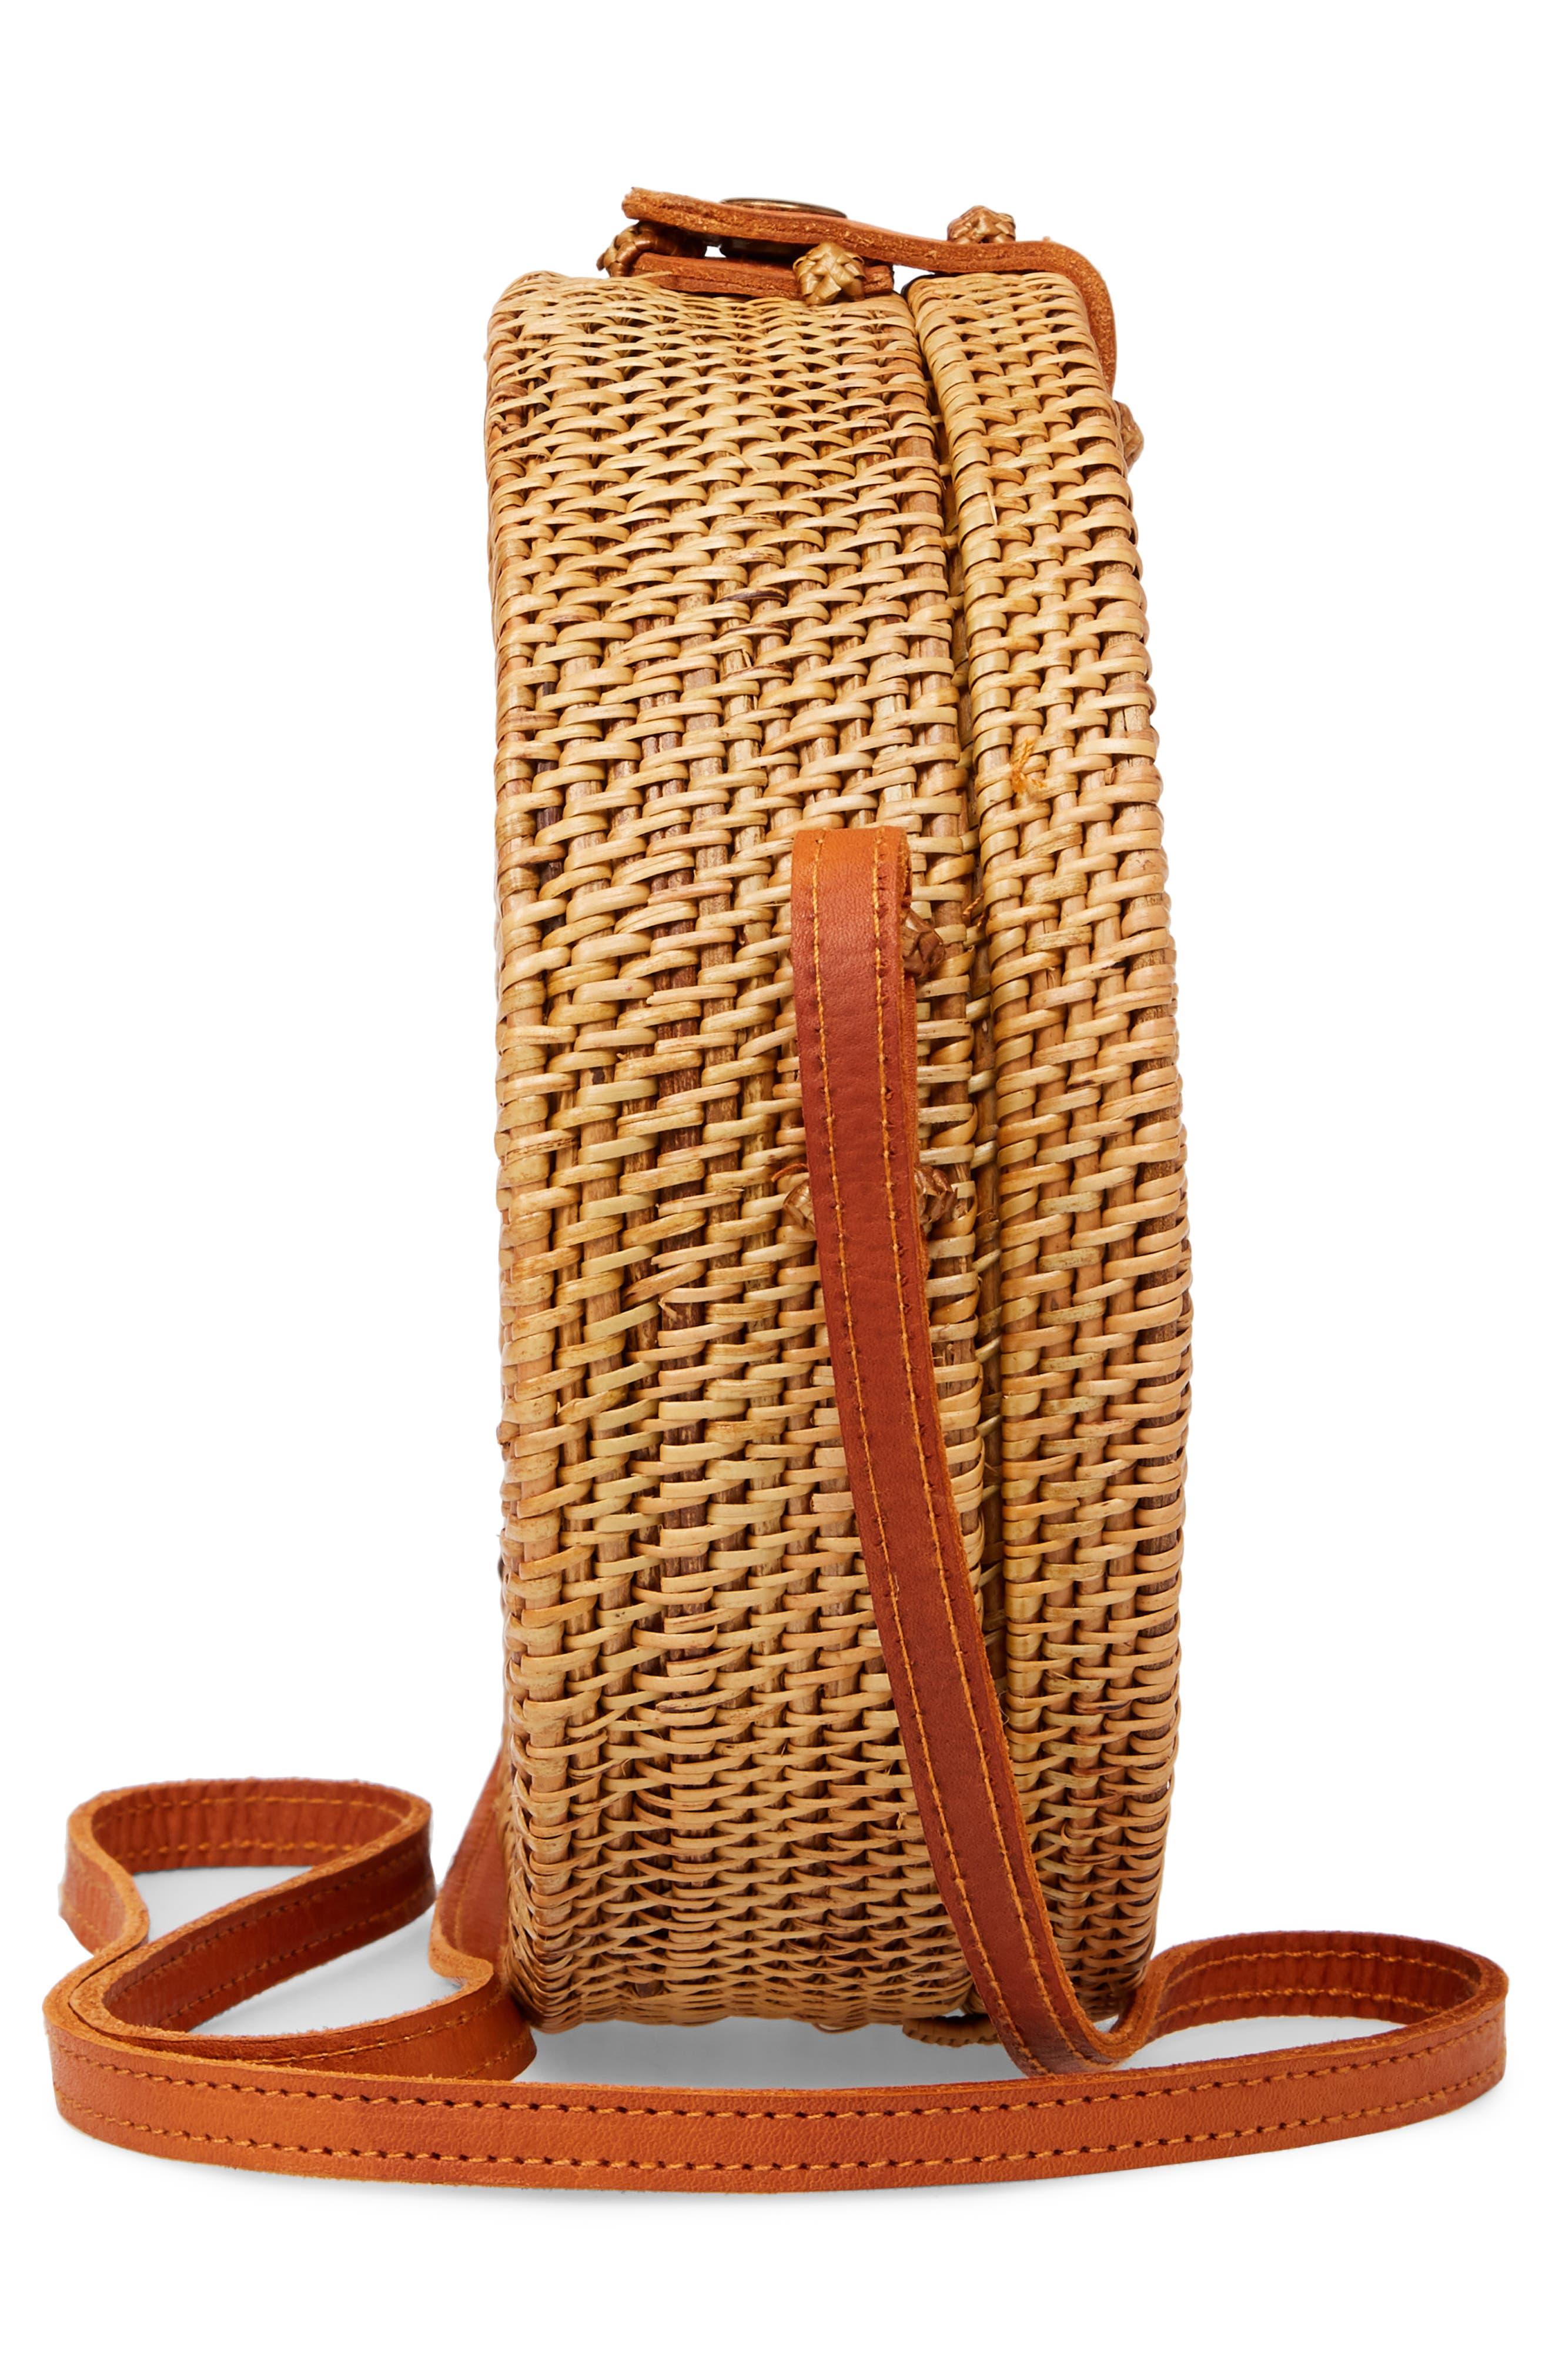 Woven Rattan Circle Basket Crossbody,                             Alternate thumbnail 4, color,                             Tan